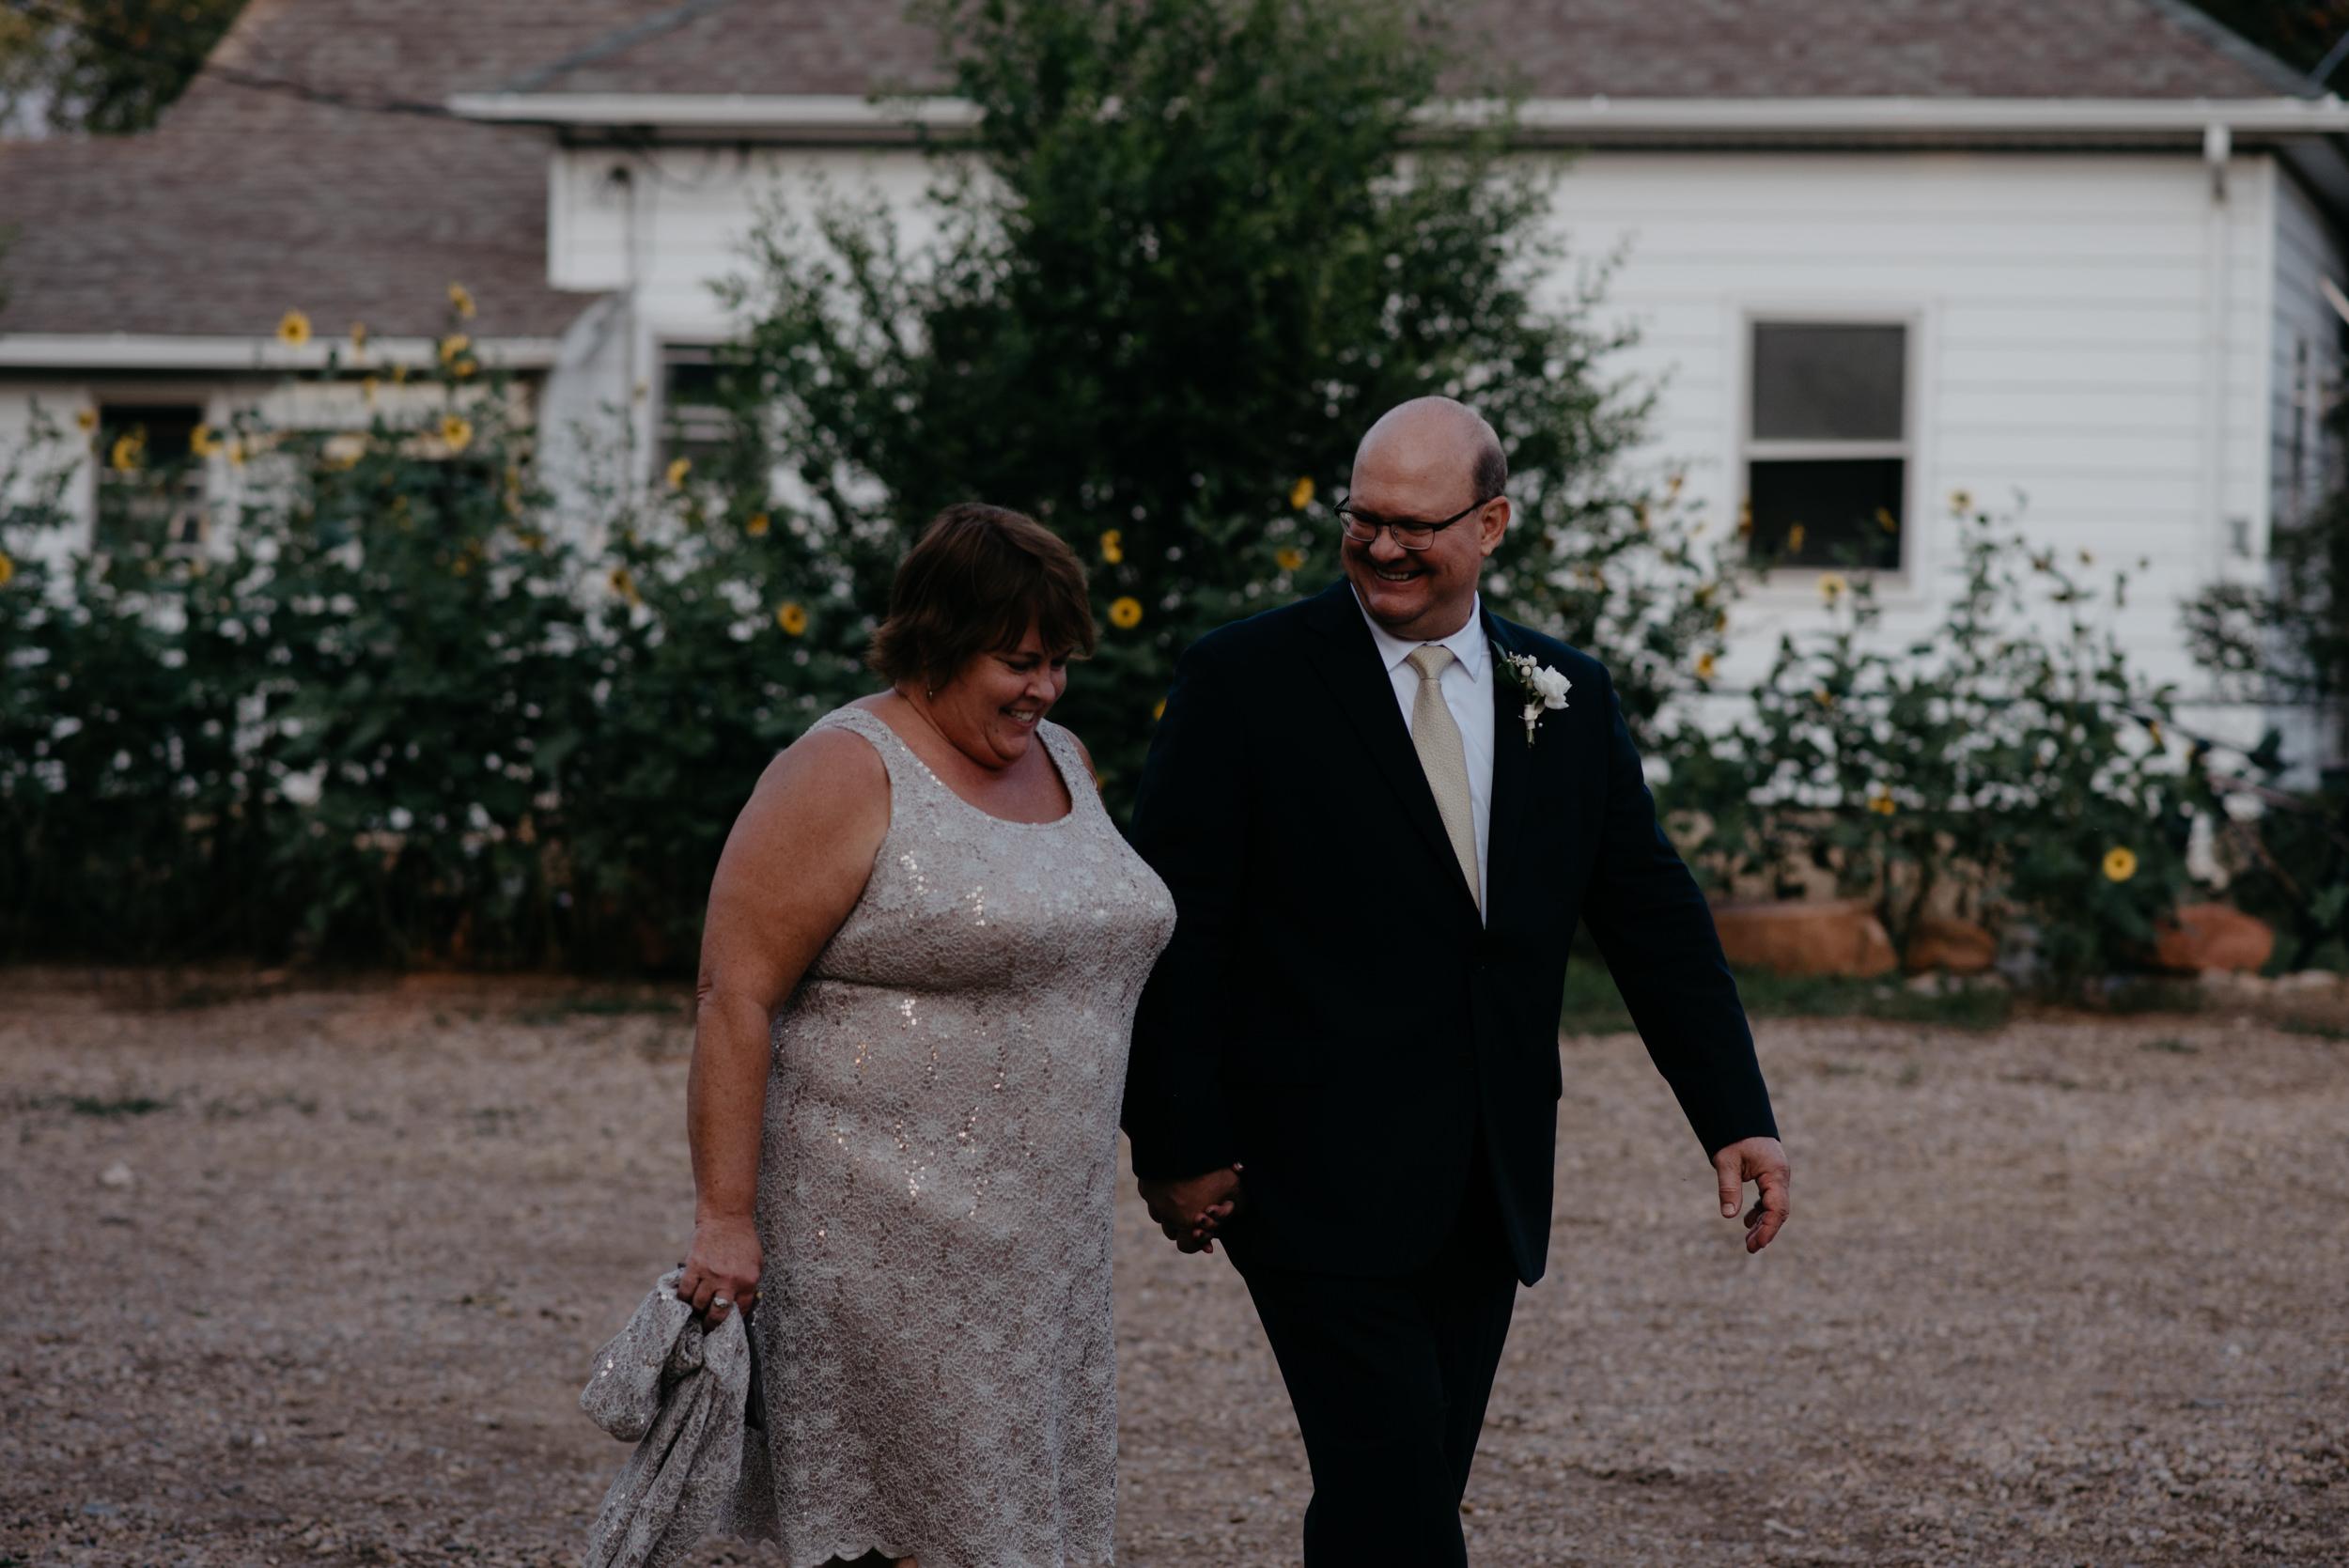 Parents of bride and groom. Boulder wedding photographer. Colorado wedding and elopement photographer. Three Leaf Farm wedding in Boulder, Colorado.